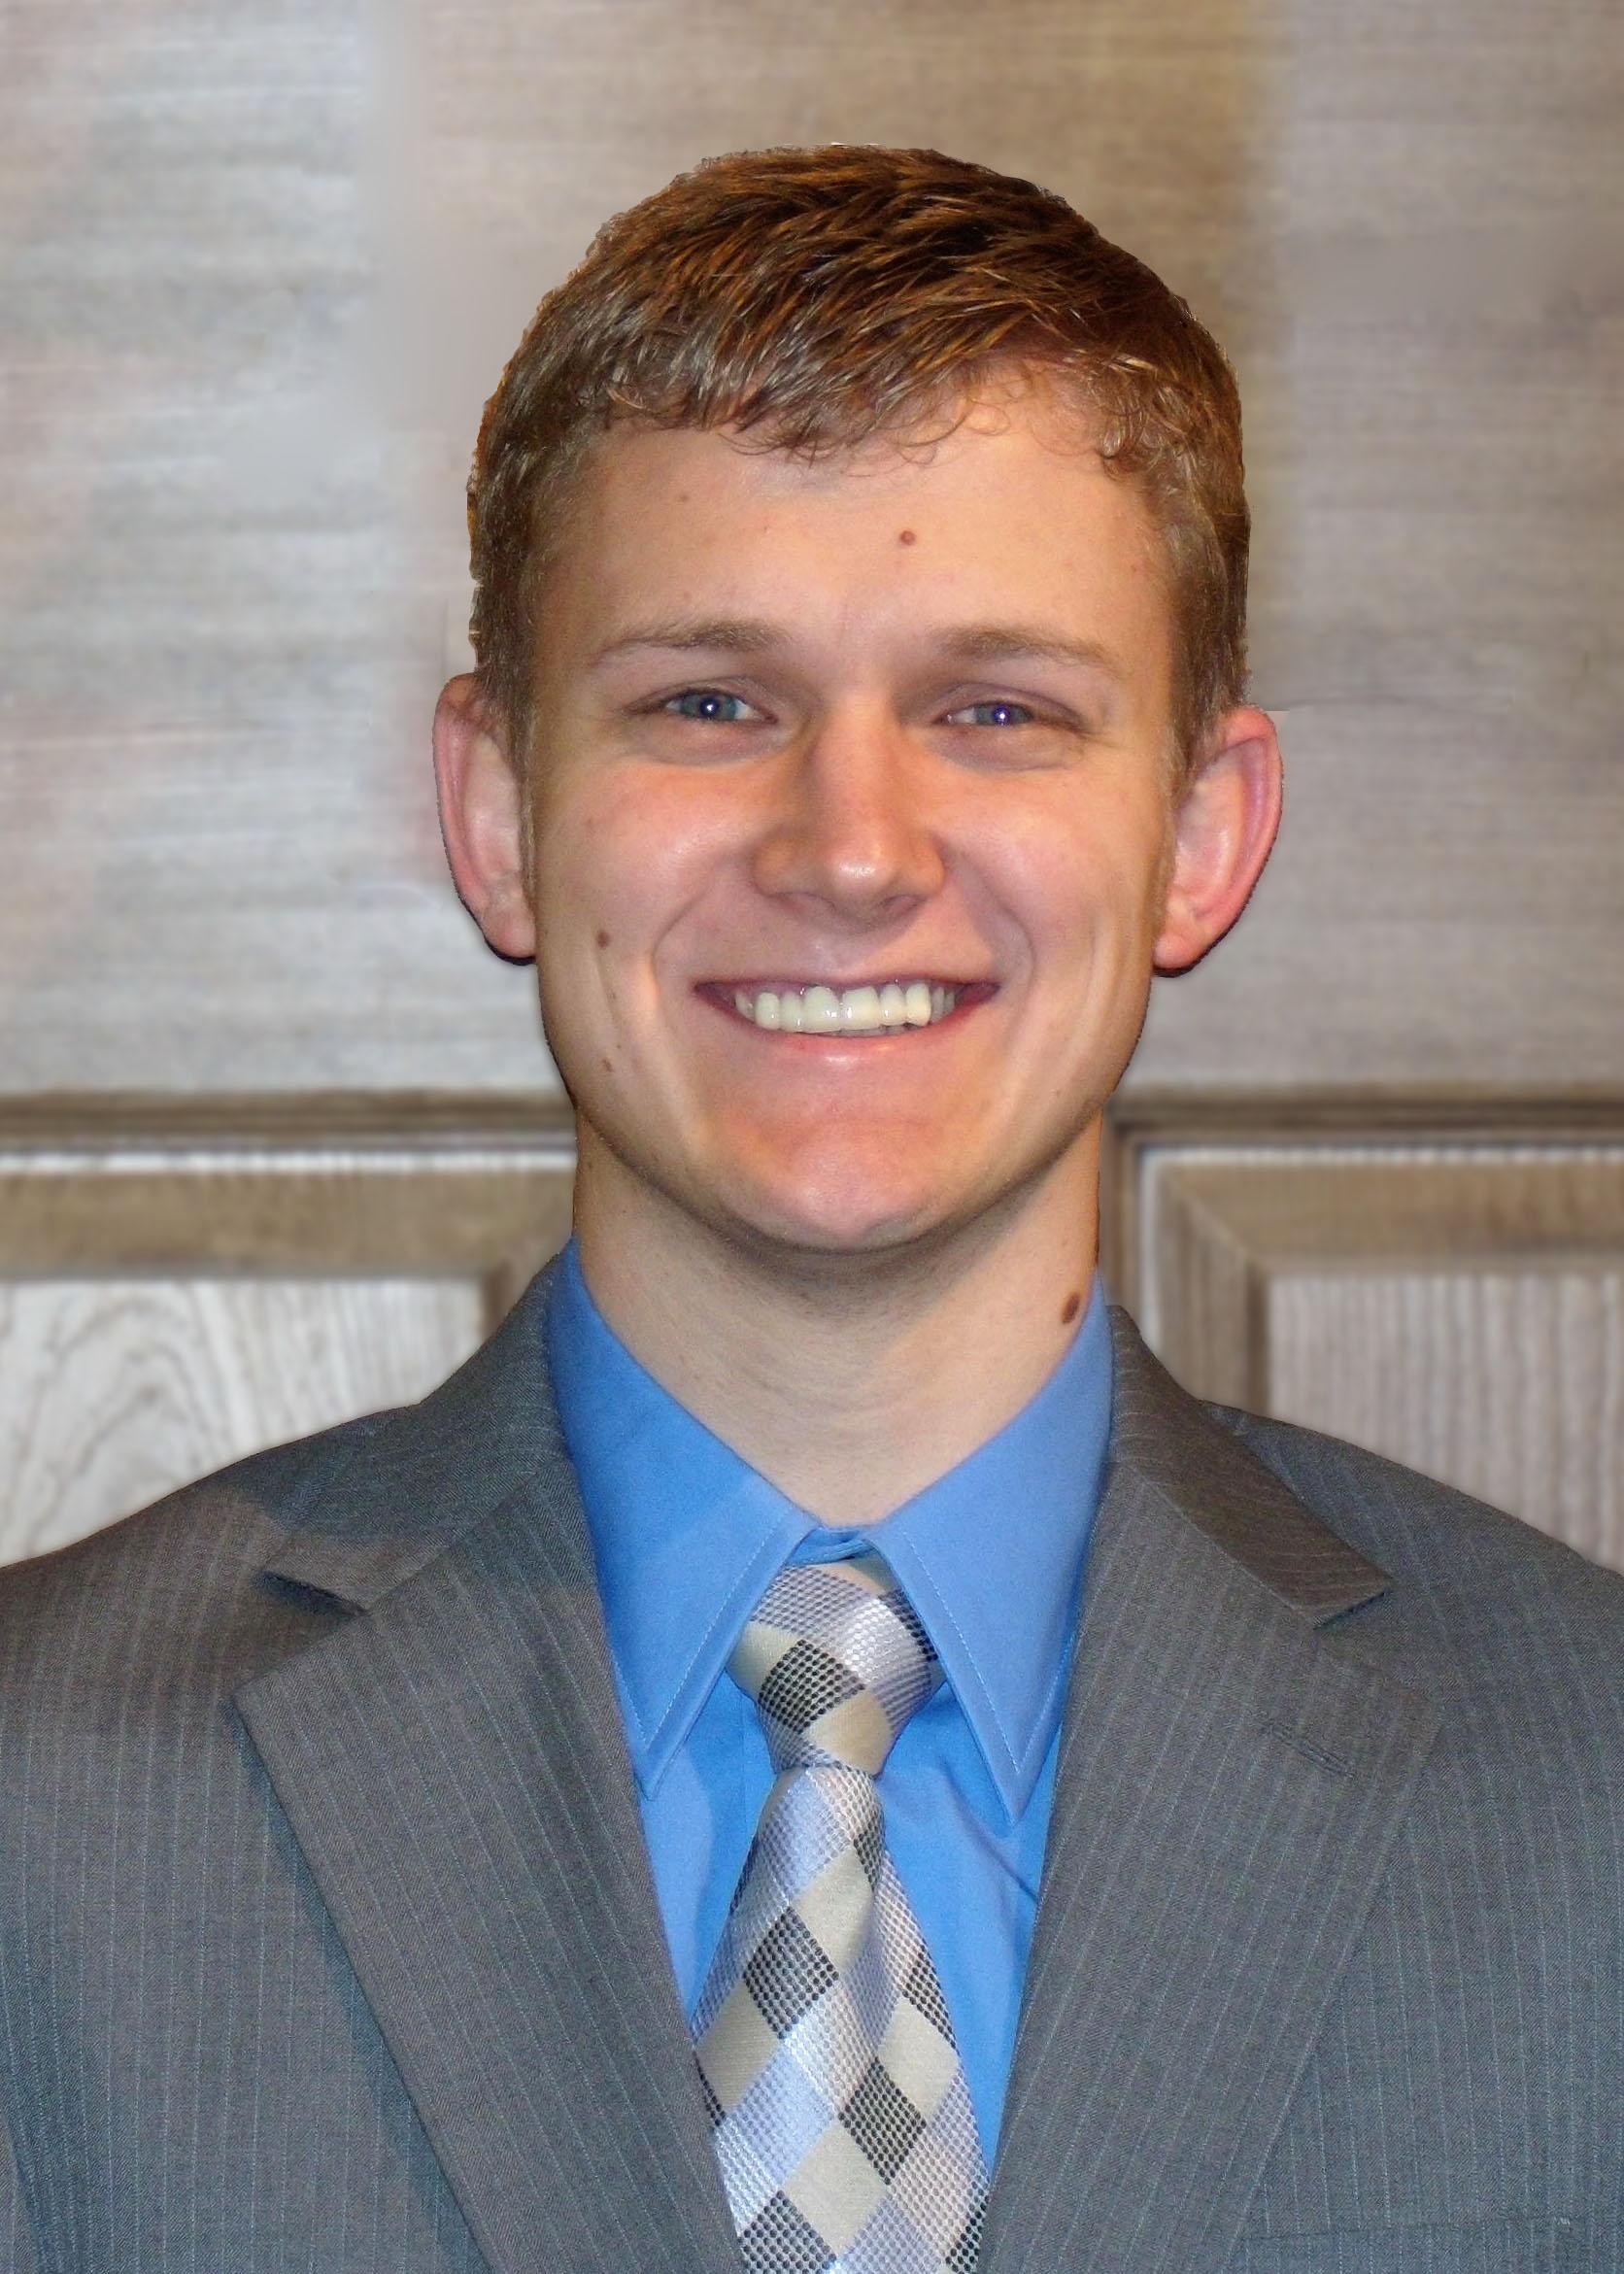 Cody Scott Rogers has been selected as one of 54 2010 Truman Scholars.